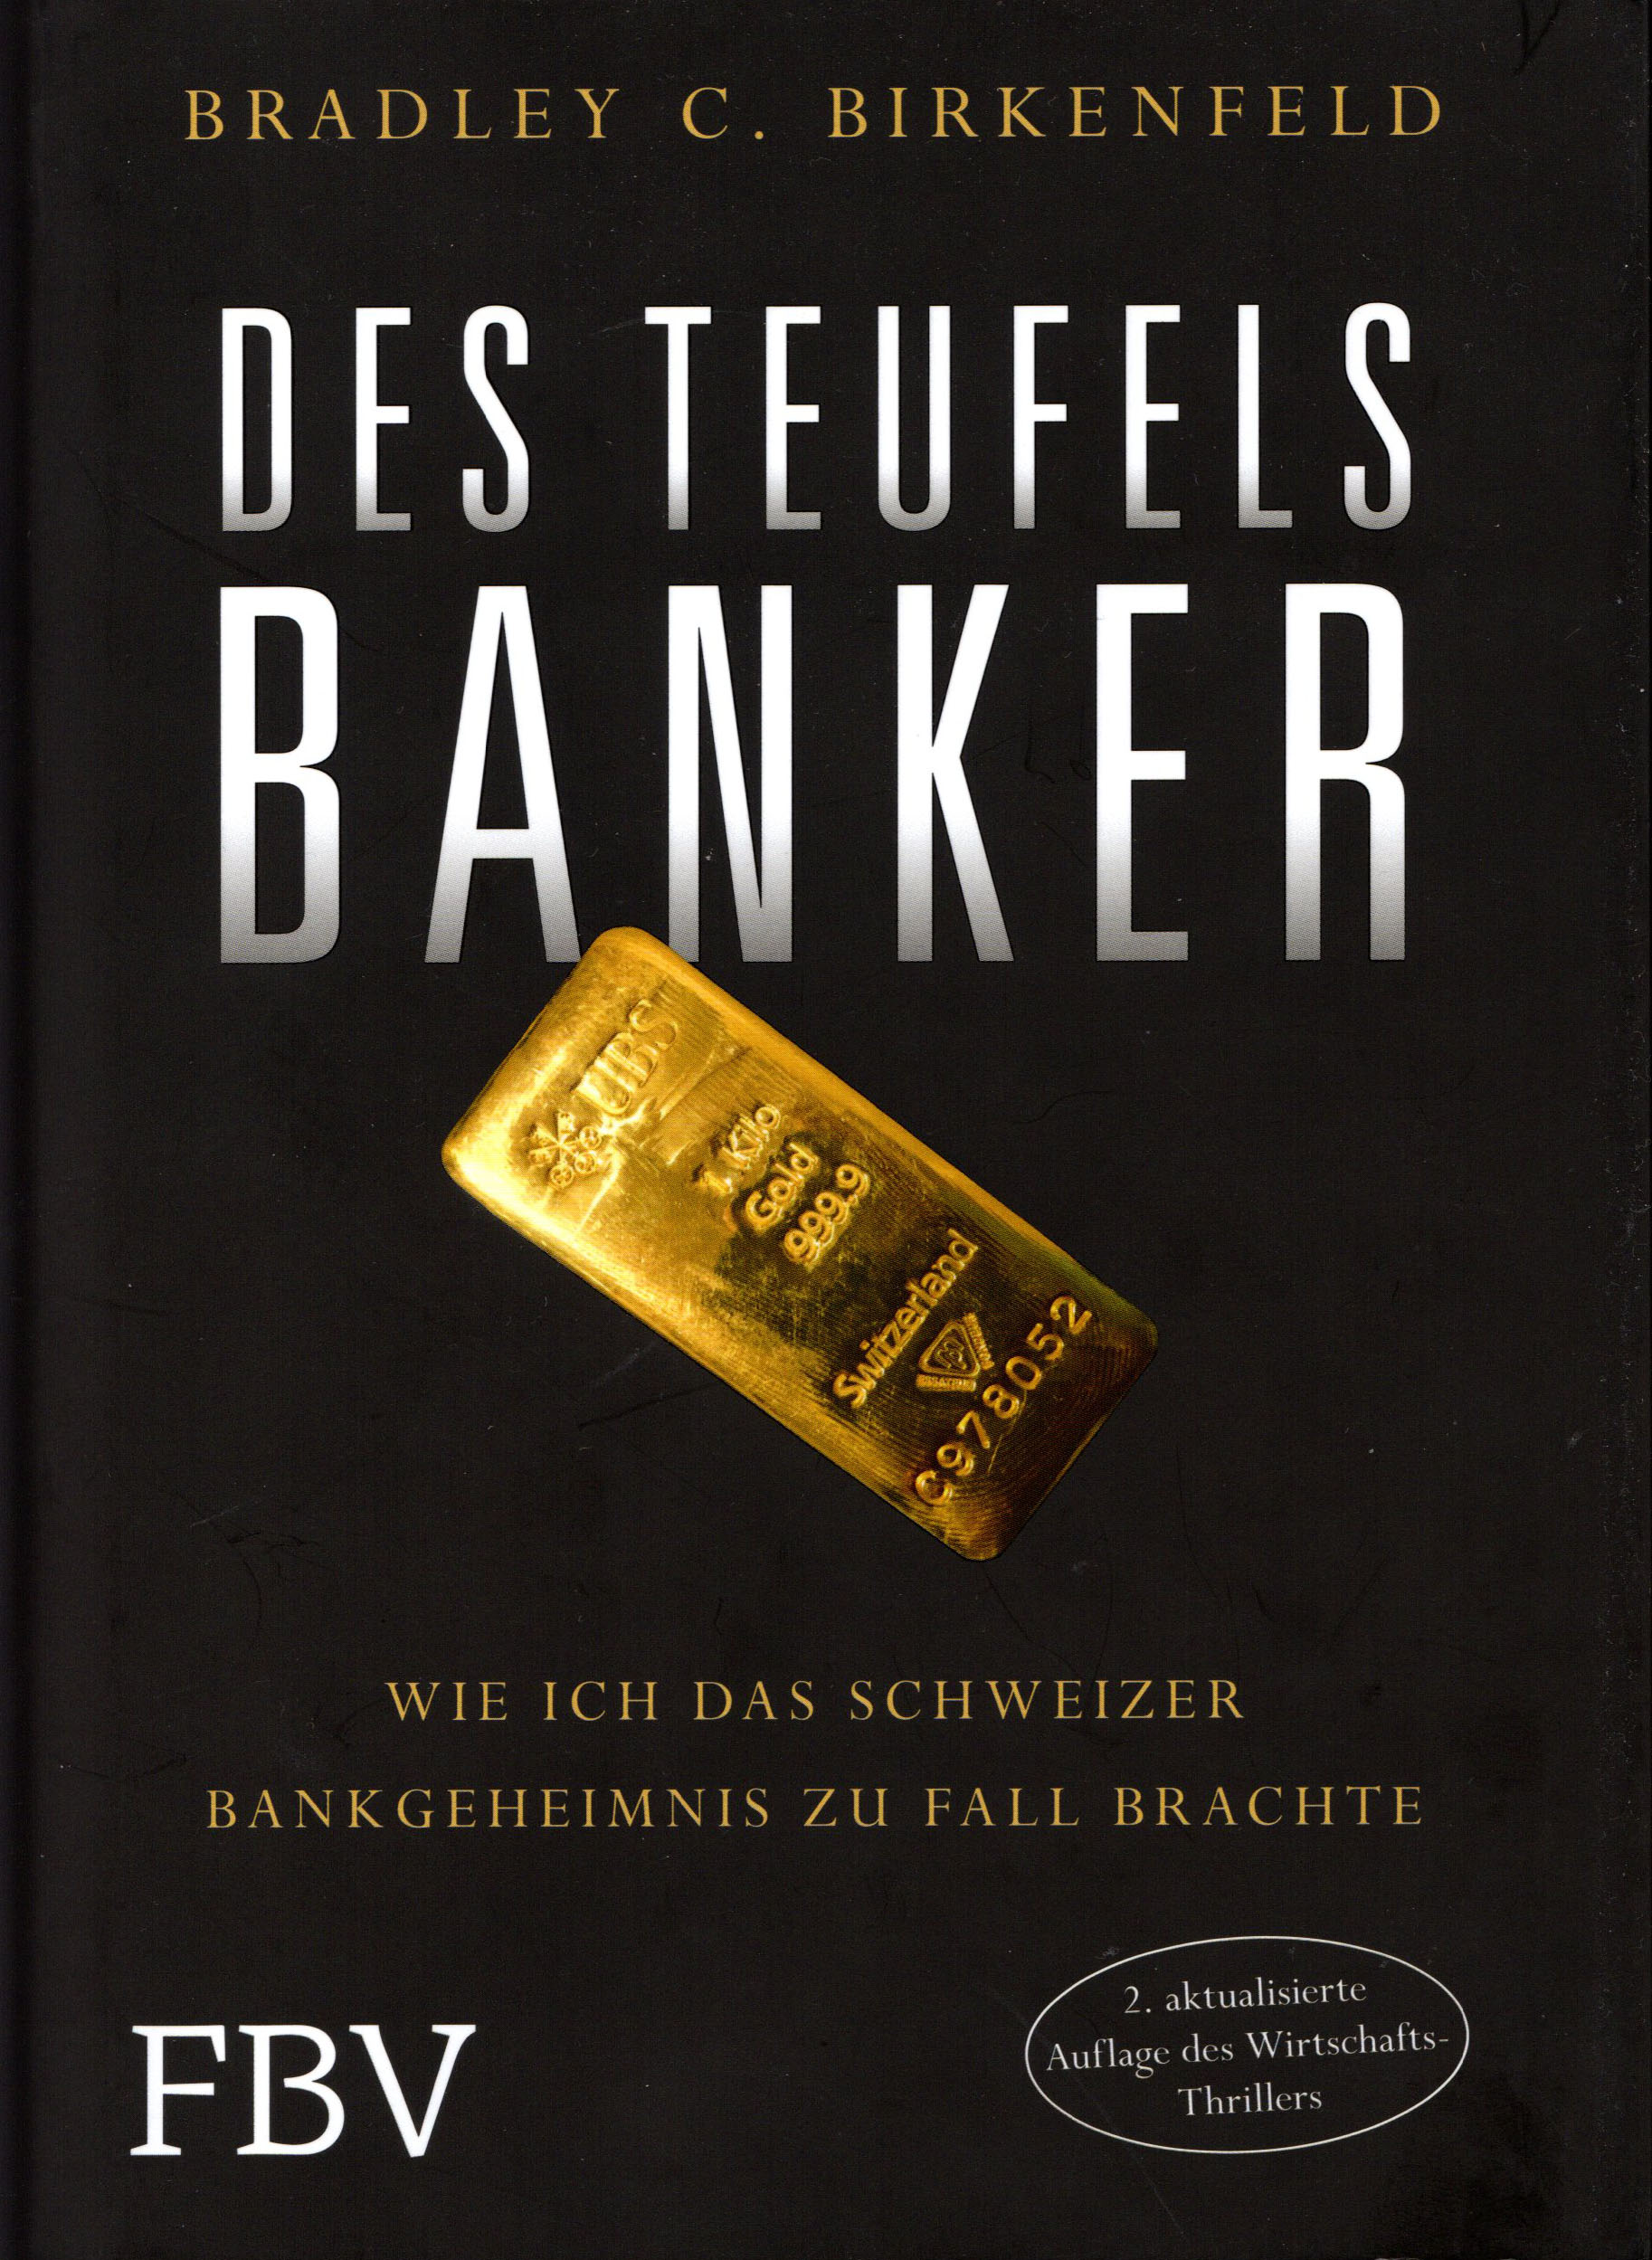 TEUFELS BANKER